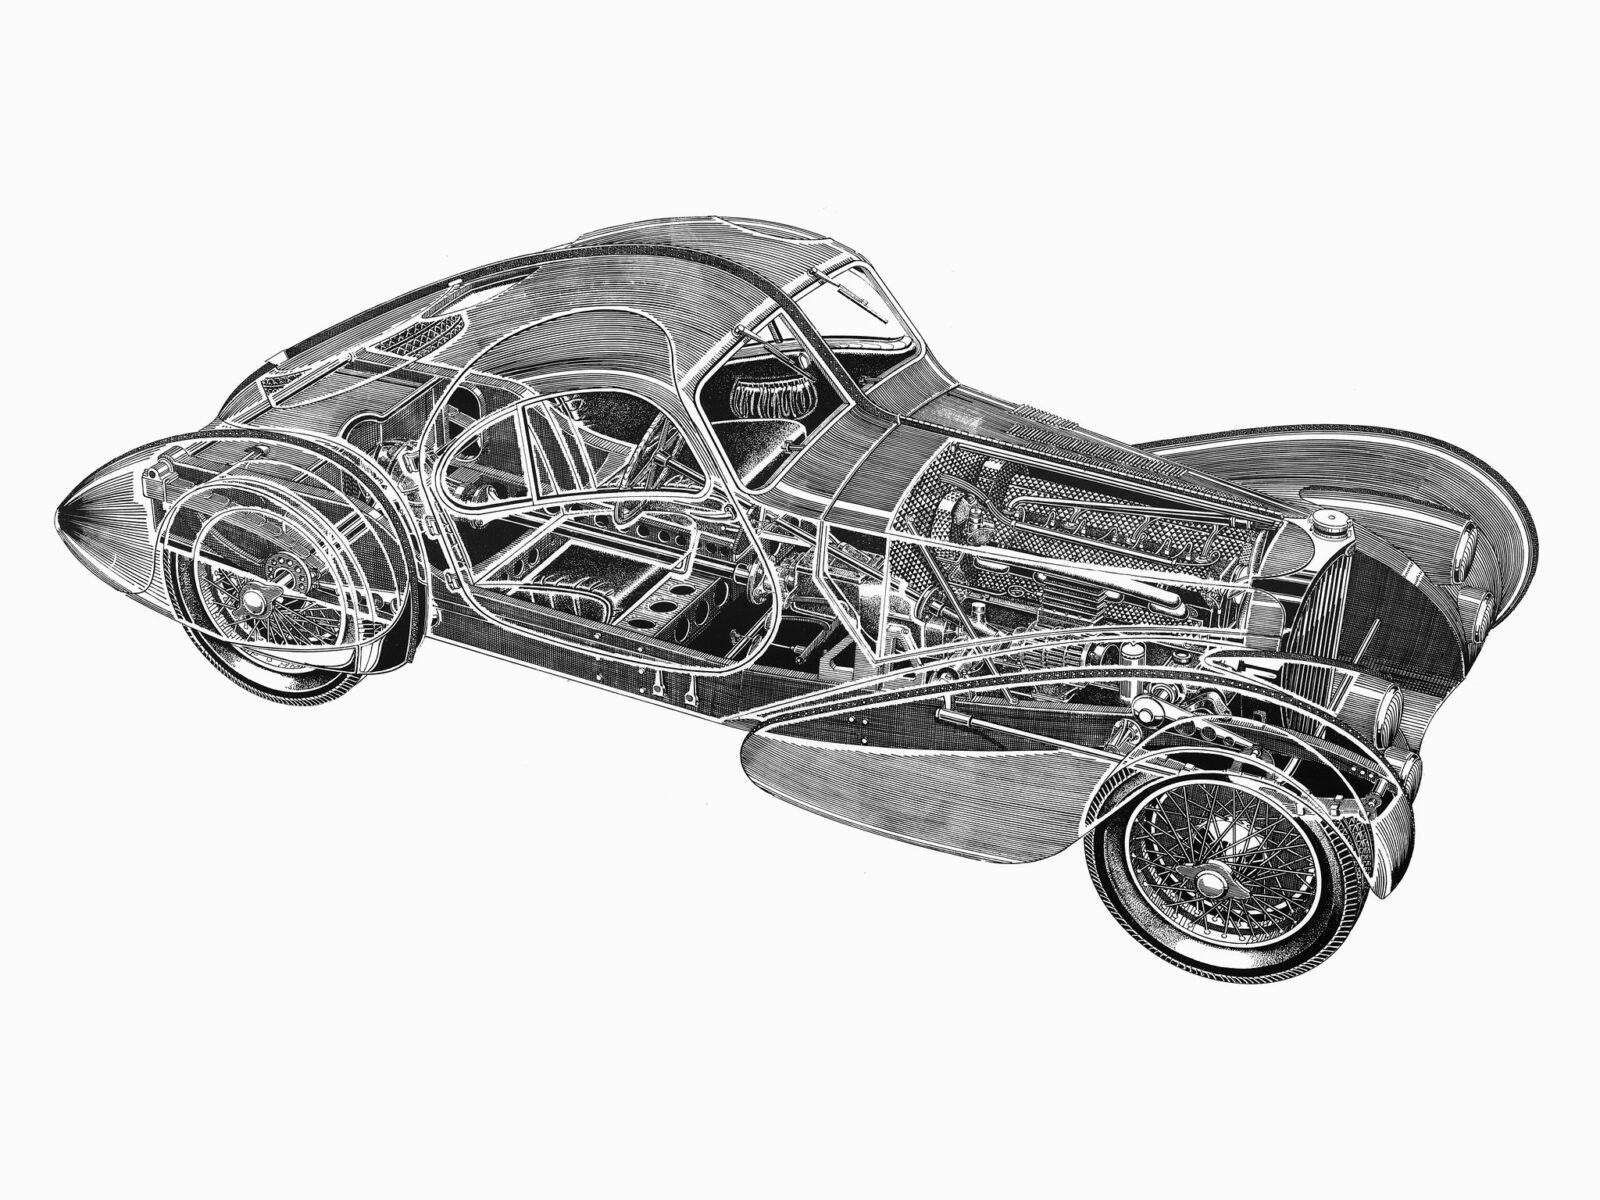 Bugatti Type 57sc 2 1600x1200 - Bugatti Type 57SC Cutaway Wallpaper